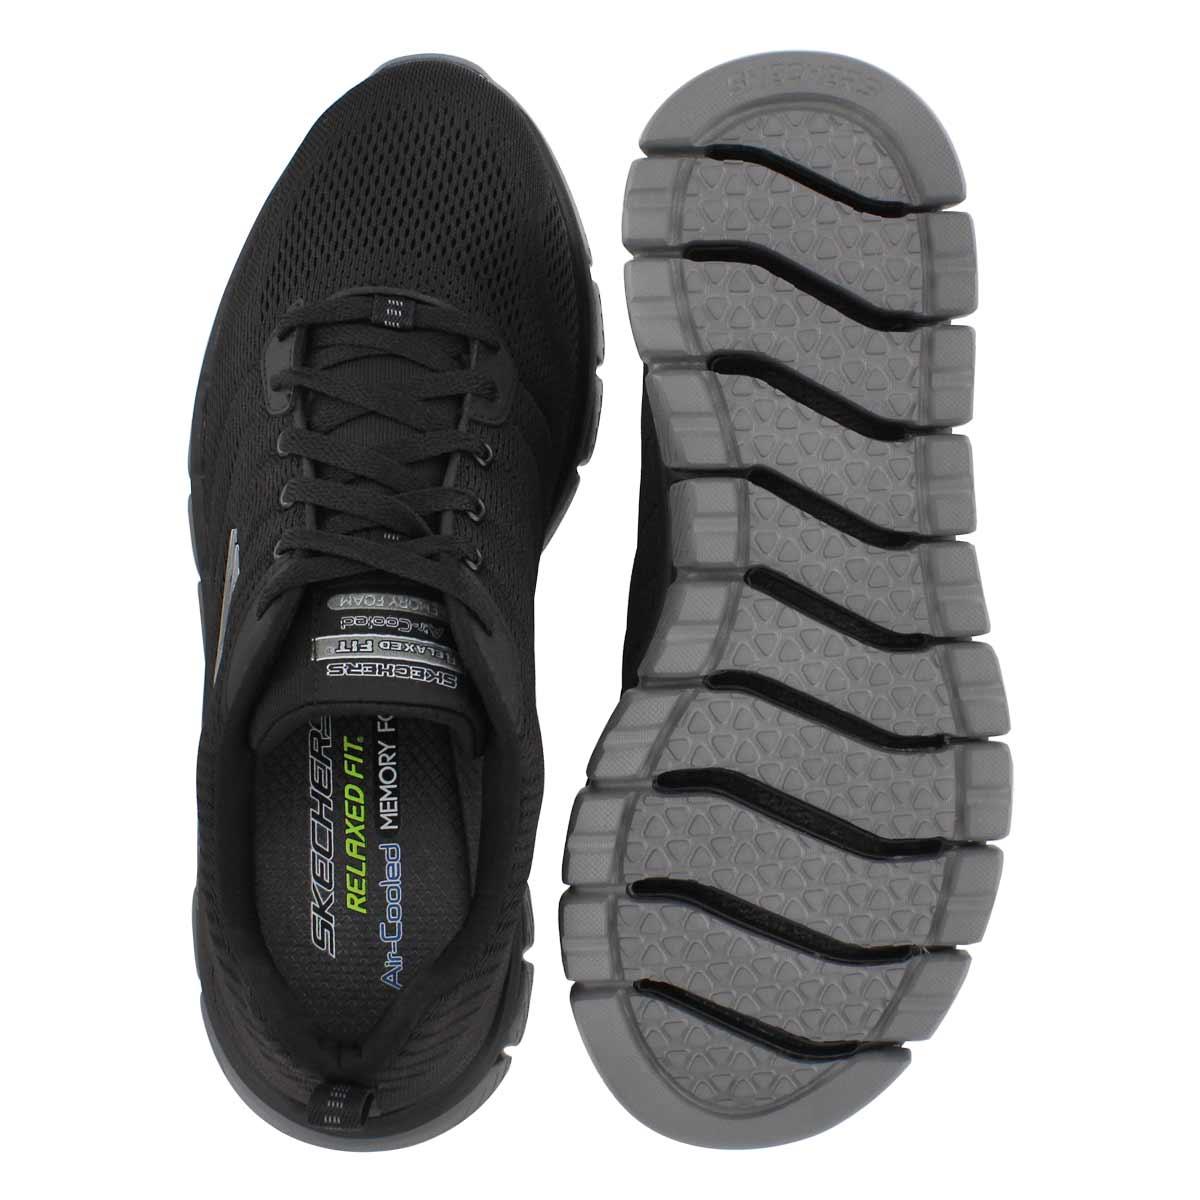 Mns Skech-Flex 2.0 Milwee blk sneaker